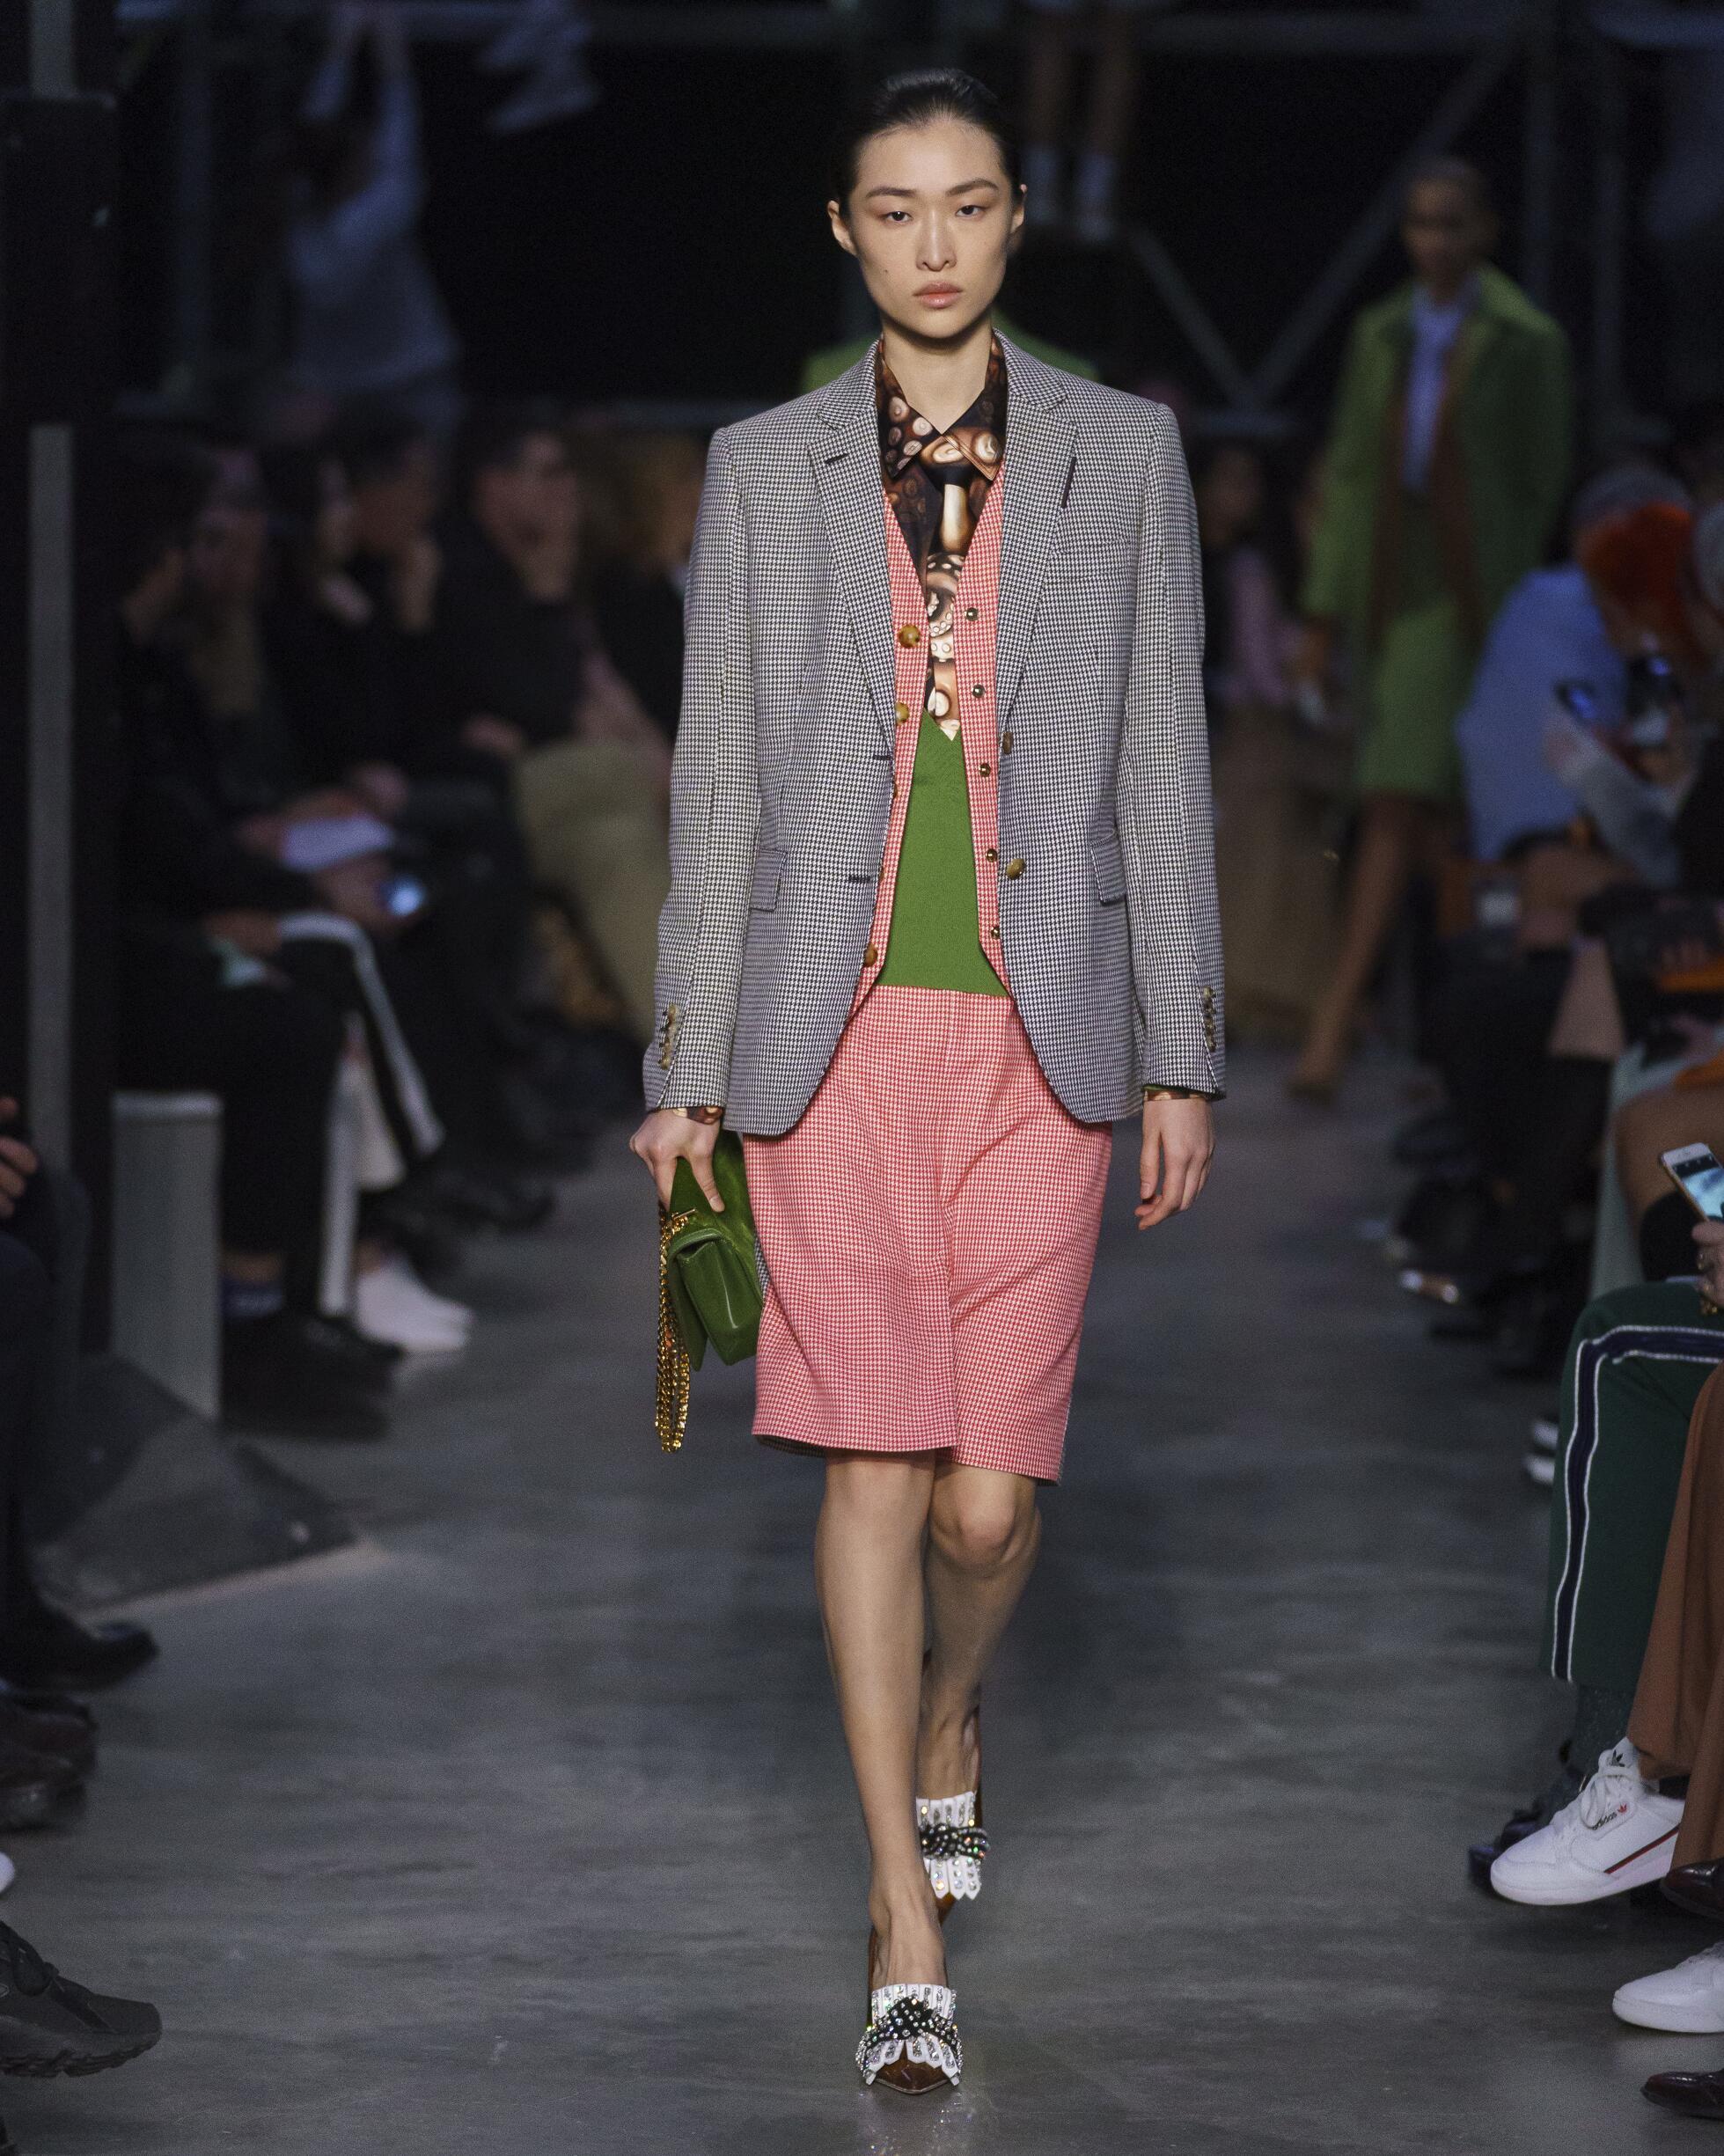 Model Fashion Week 2019 Catwalk Burberry